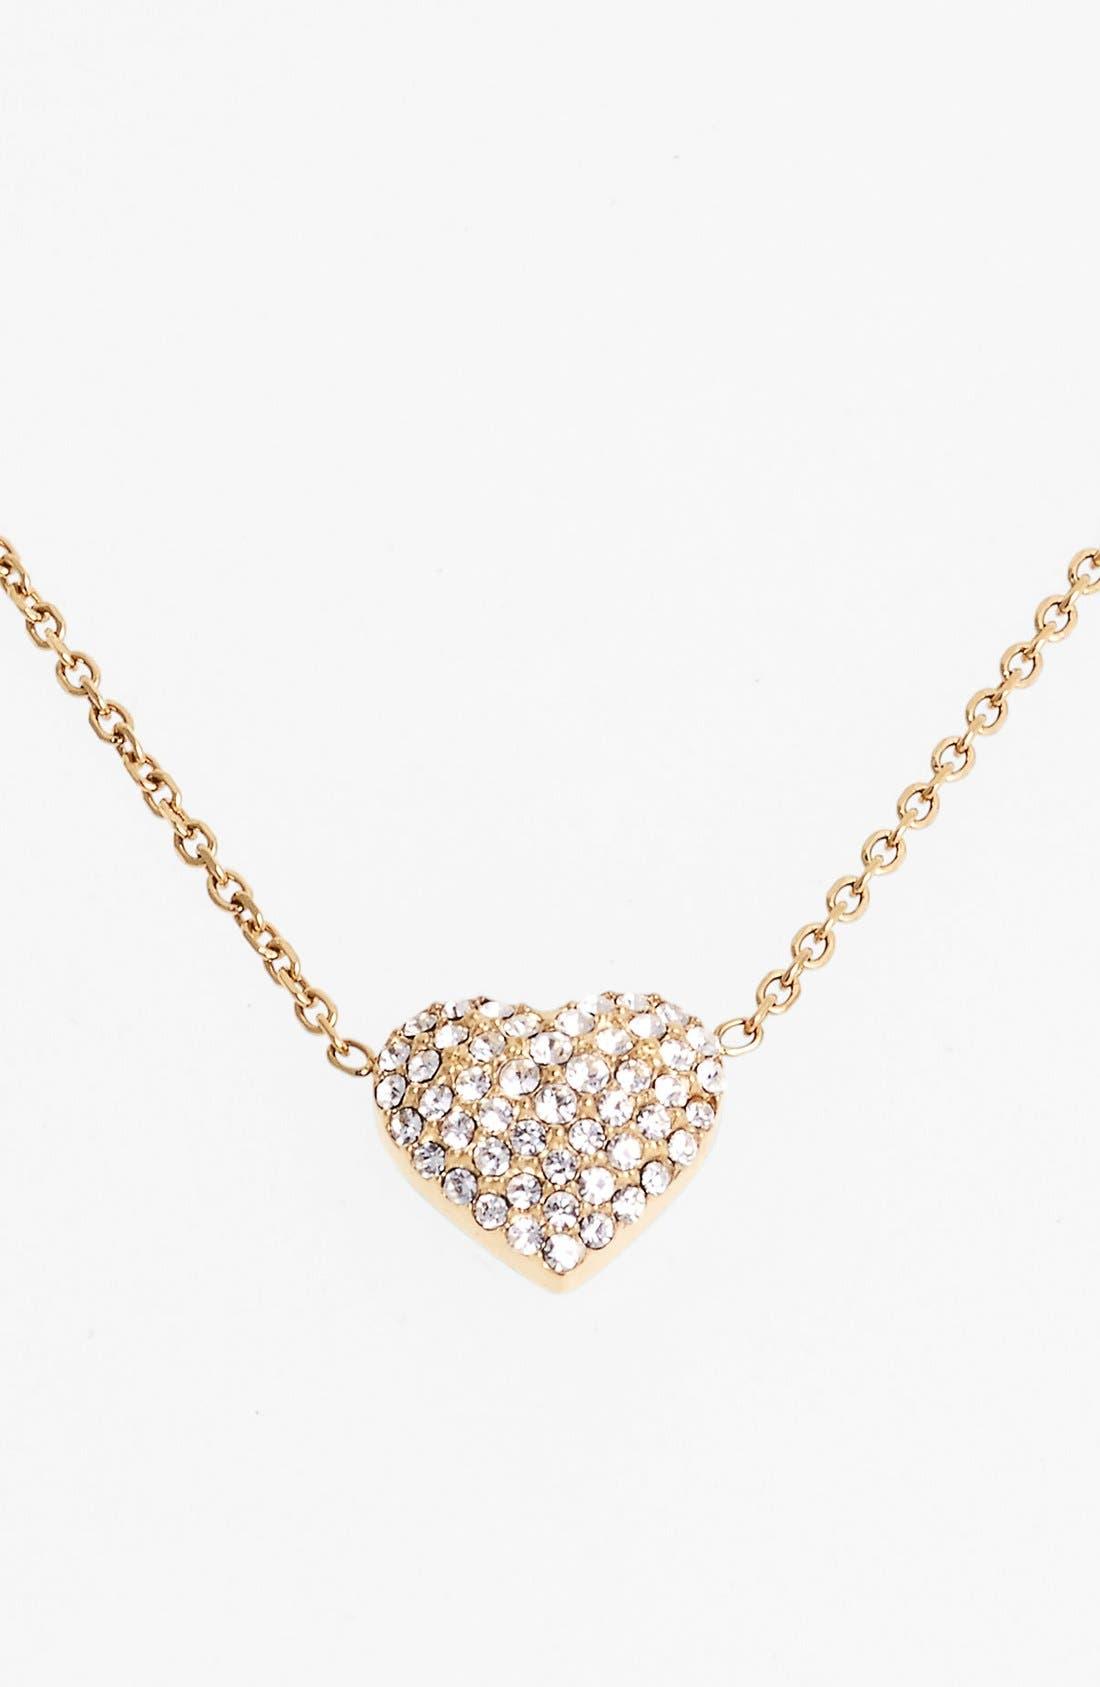 Alternate Image 1 Selected - Michael Kors 'Brilliance' Pavé Heart Necklace